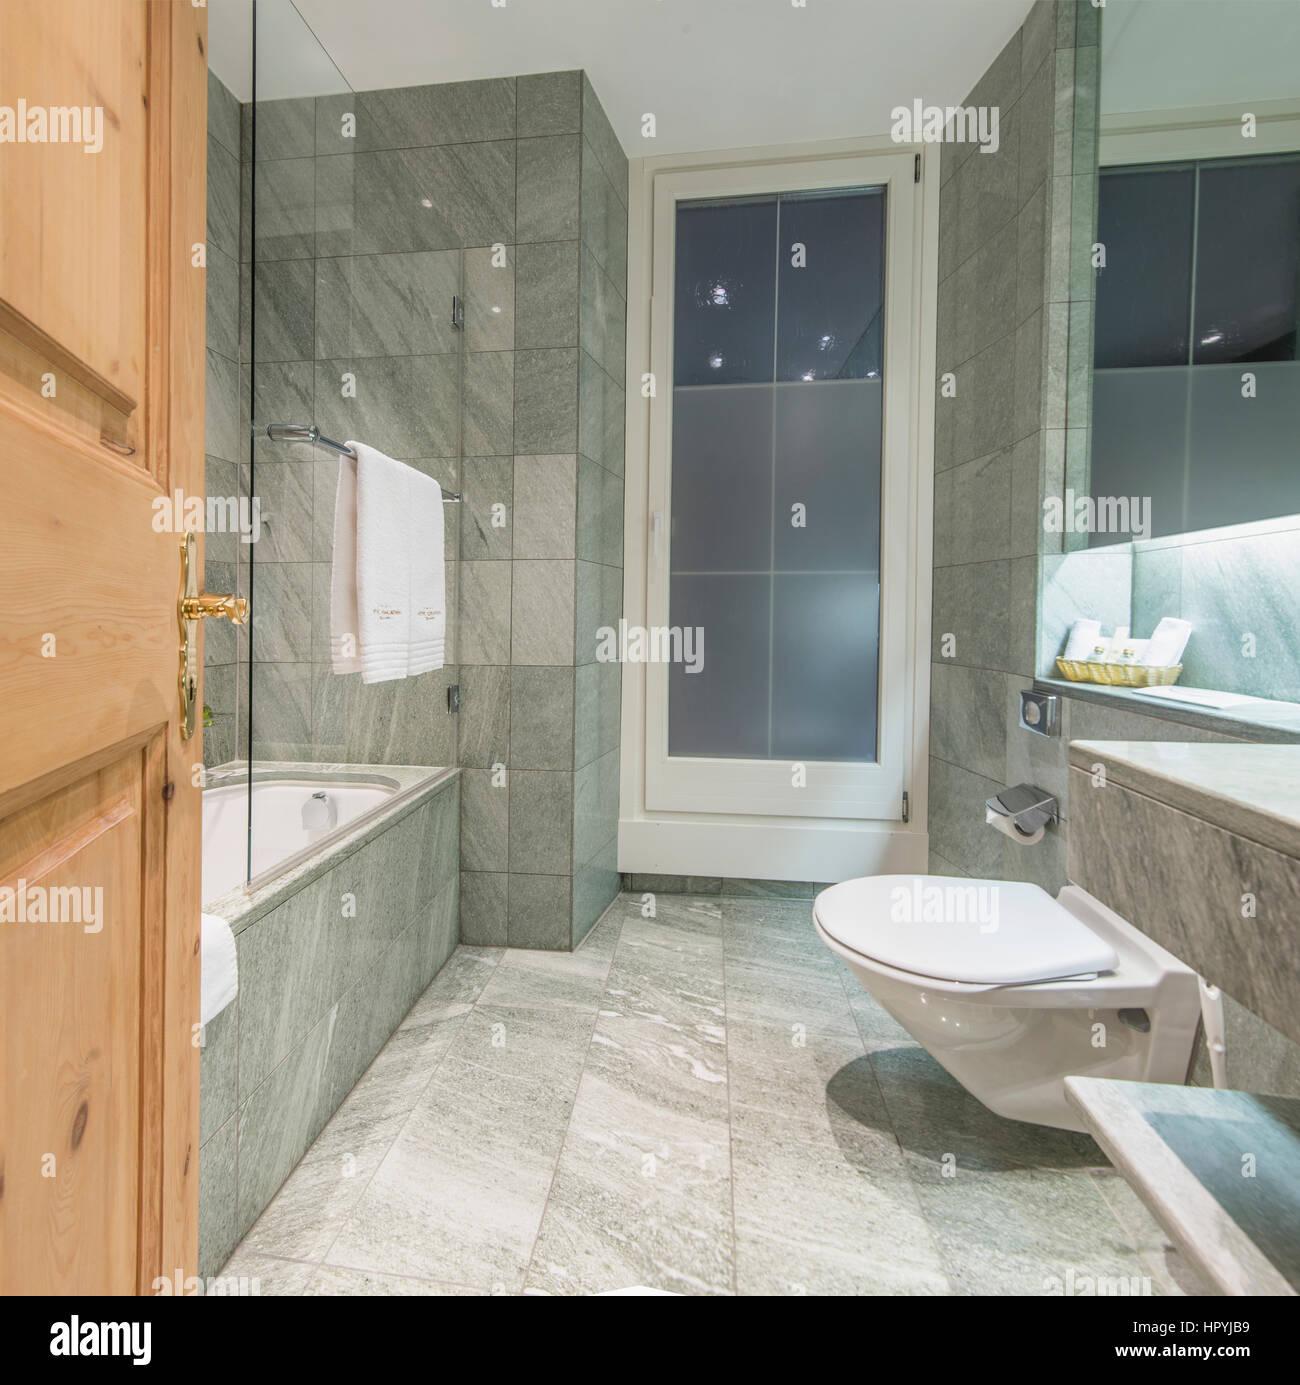 badewanne stockfotos badewanne bilder alamy. Black Bedroom Furniture Sets. Home Design Ideas